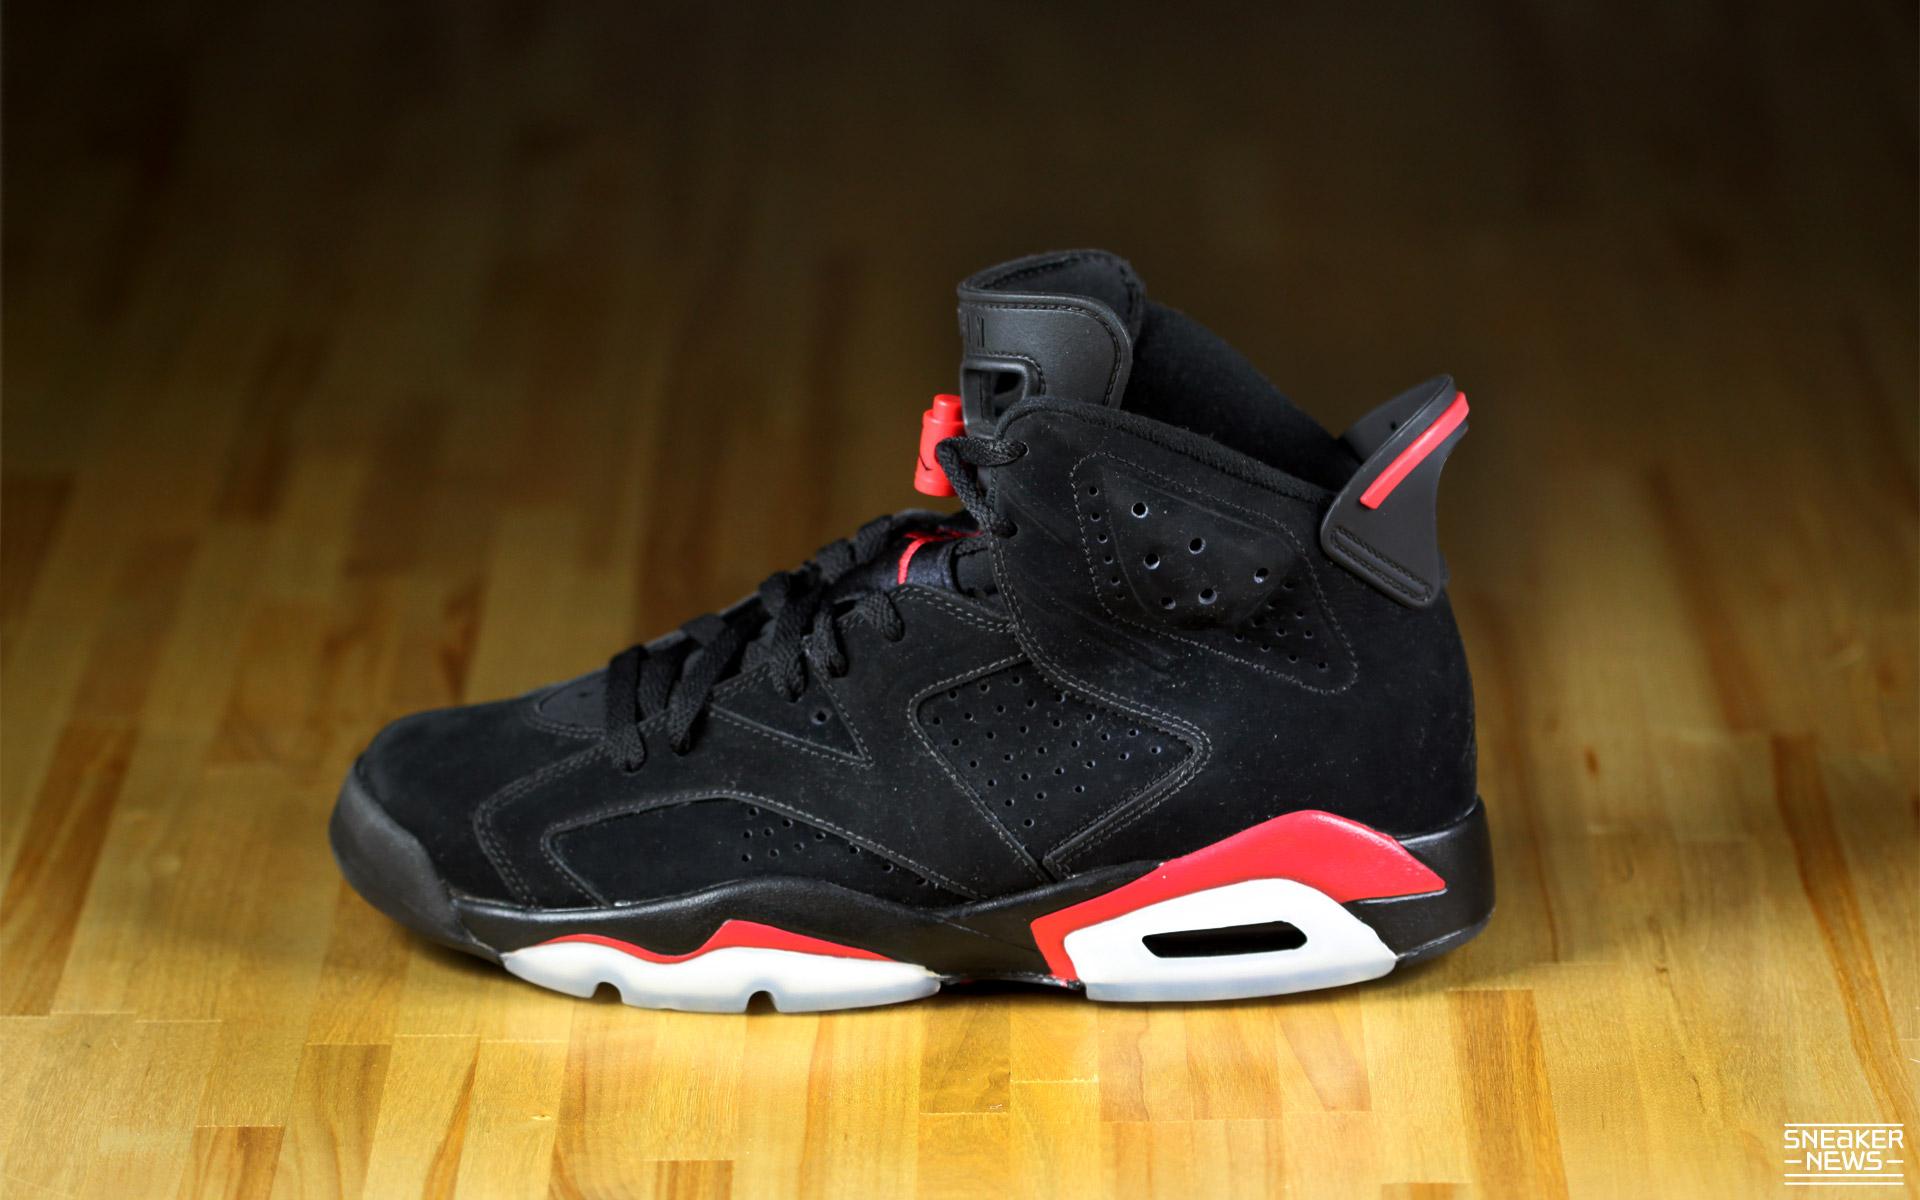 buy online 58441 77529 View 0. Sneaker Wallpapers SneakerNewscom 1920x1200